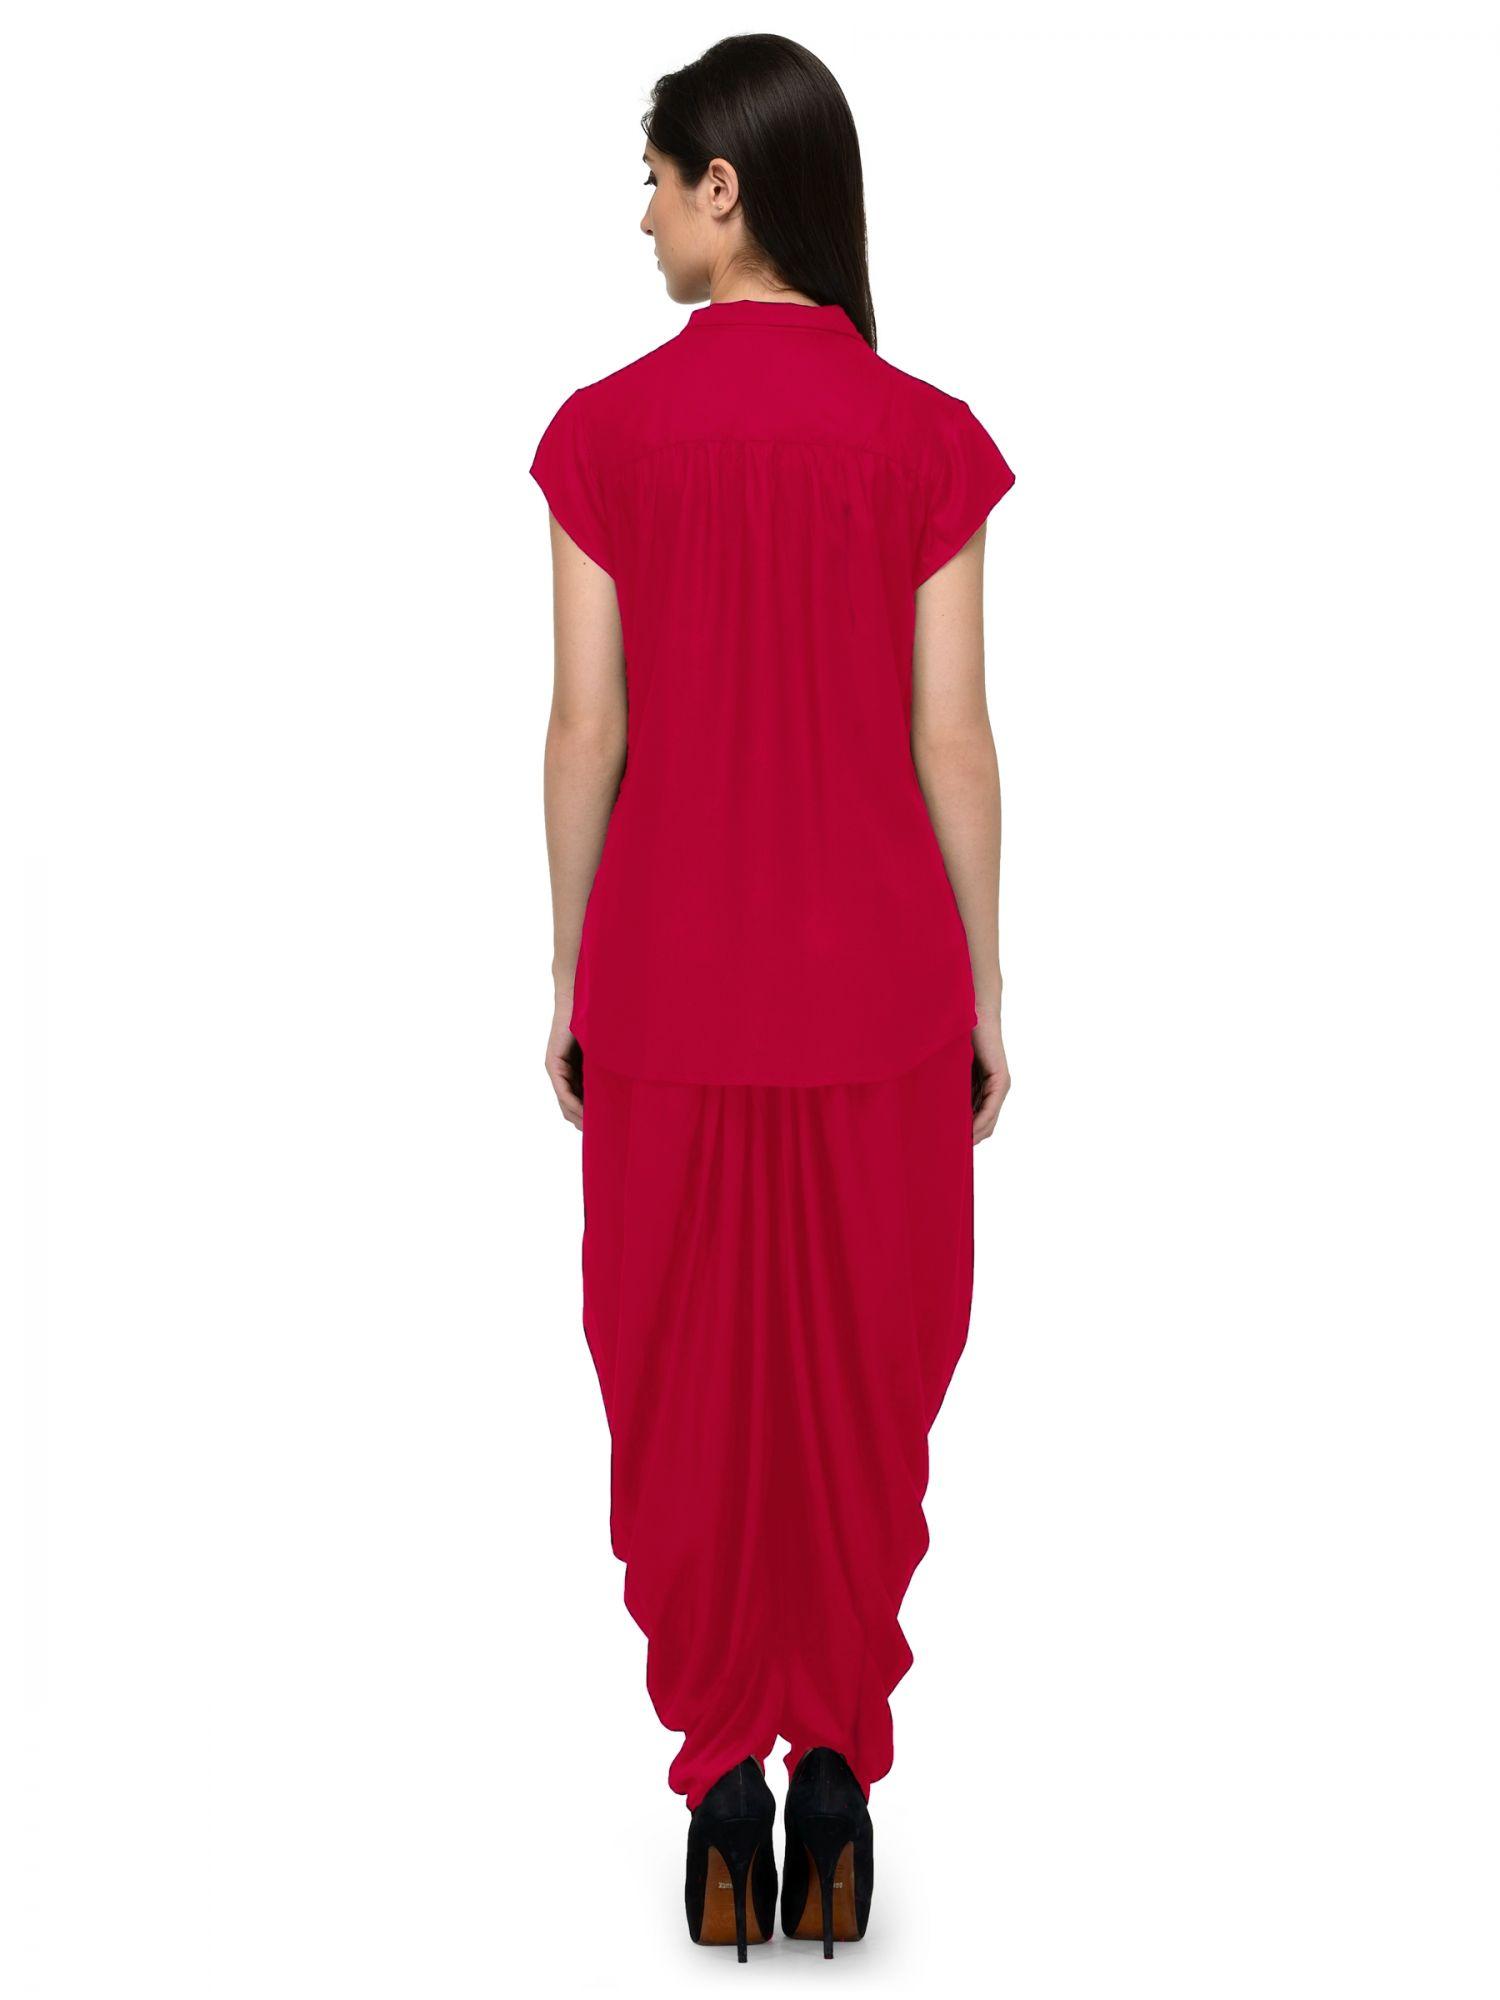 Nightshirt and Dhoti Pant Set in Fuchsia